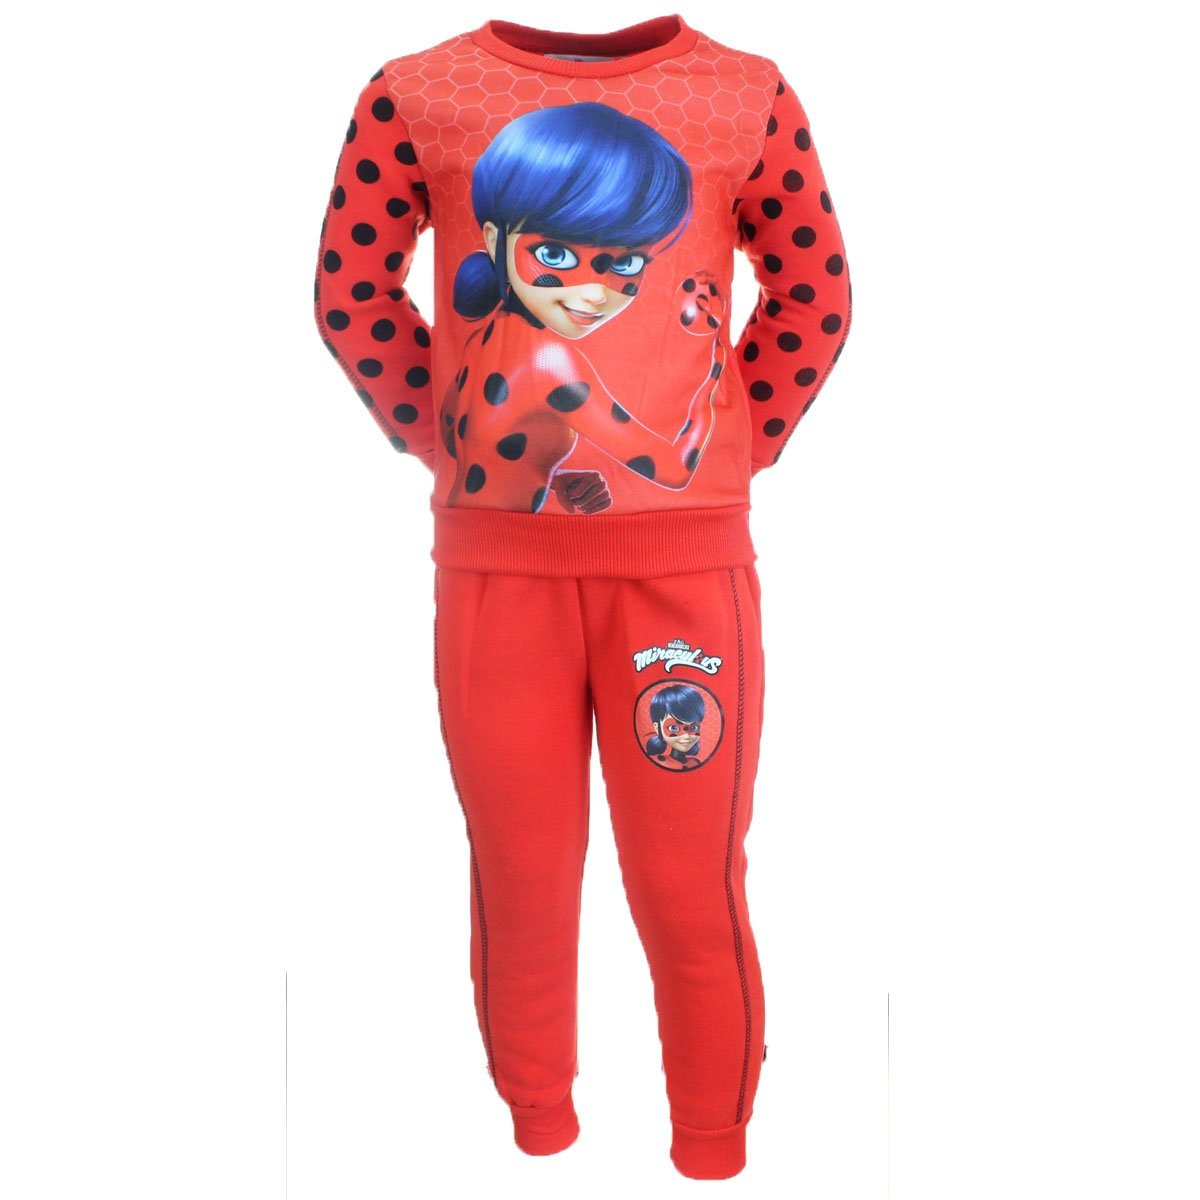 Ladybug - Tuta da ginnastica - ragazza